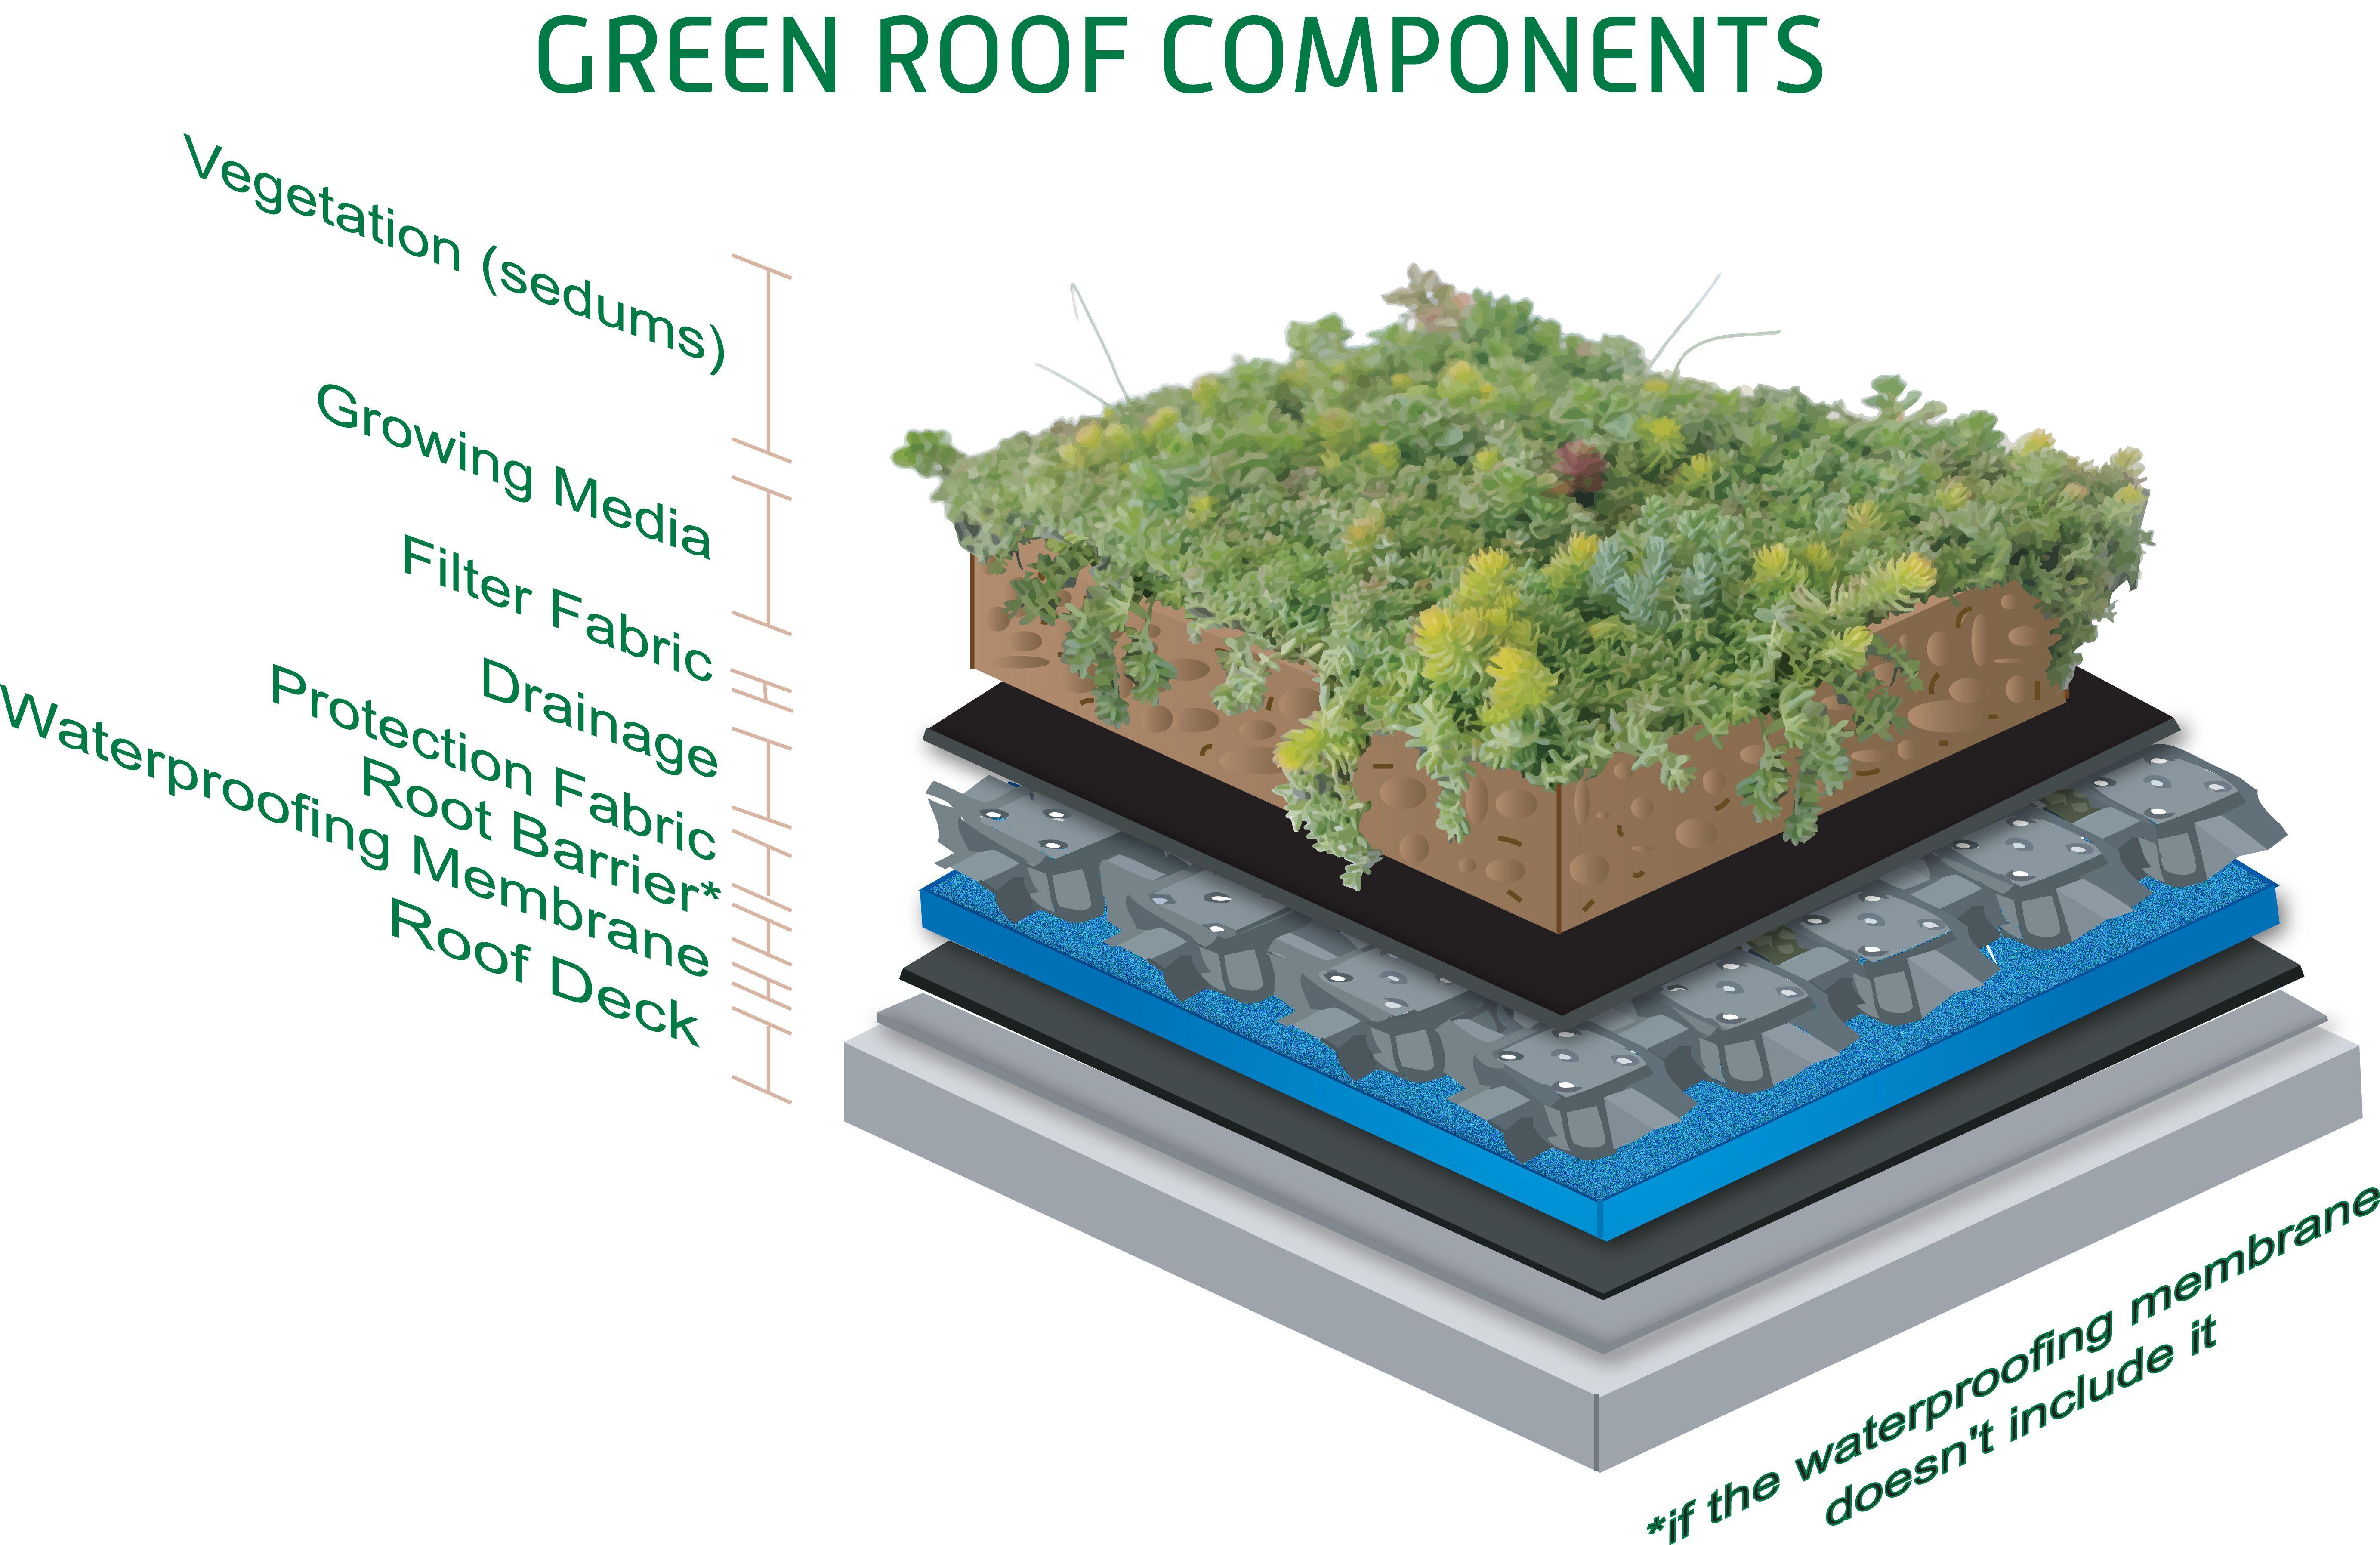 Green Sedum Roof Layering Components Sedum Roof Green Roof Layersv2 Sedum Roof Green Roof Green Roof System